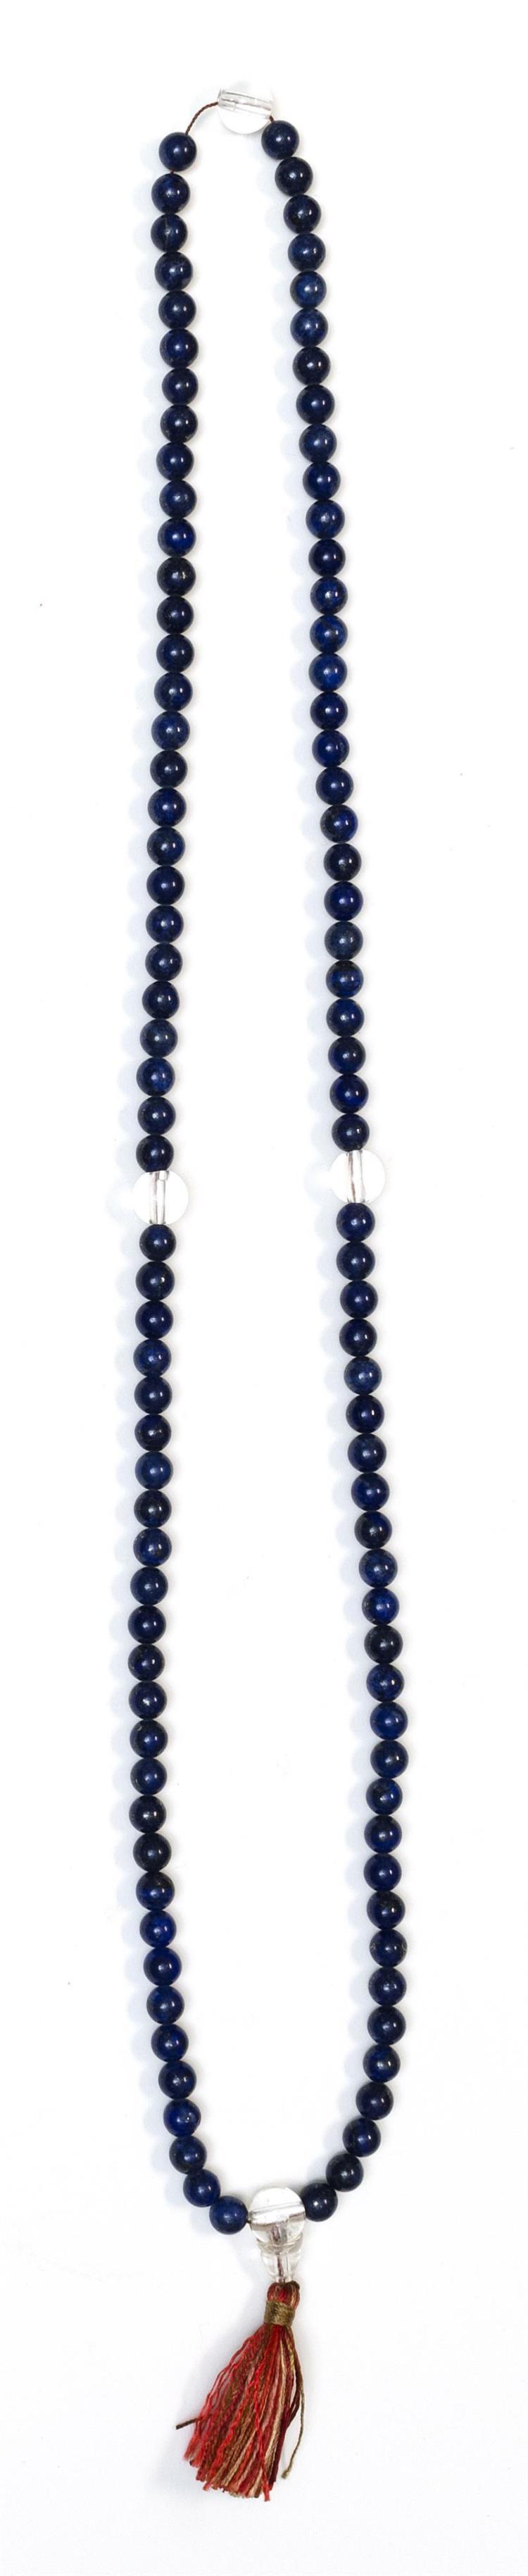 LAPIS LAZULI MALA With 7 mm beads. Length 36